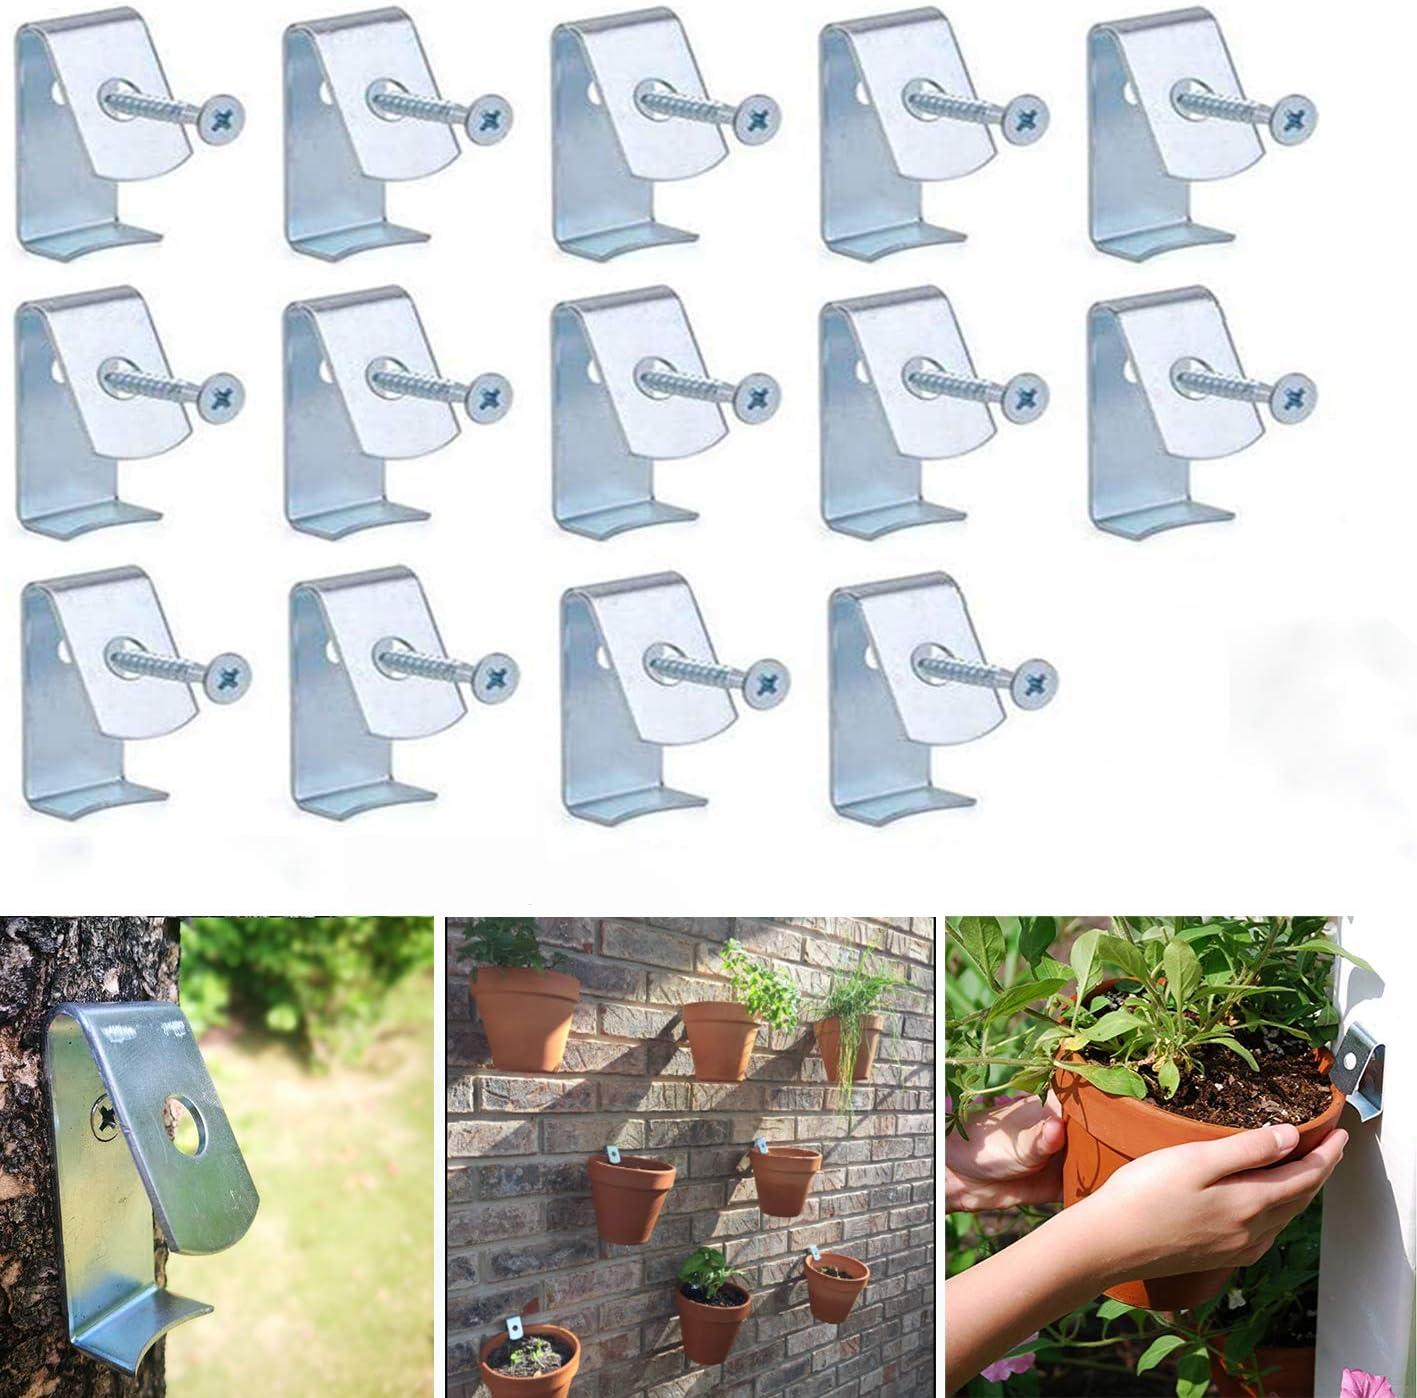 NIUXX Flower Pot Clips 14 Pack of Plant Pot Holder with Screw Suit c190fd